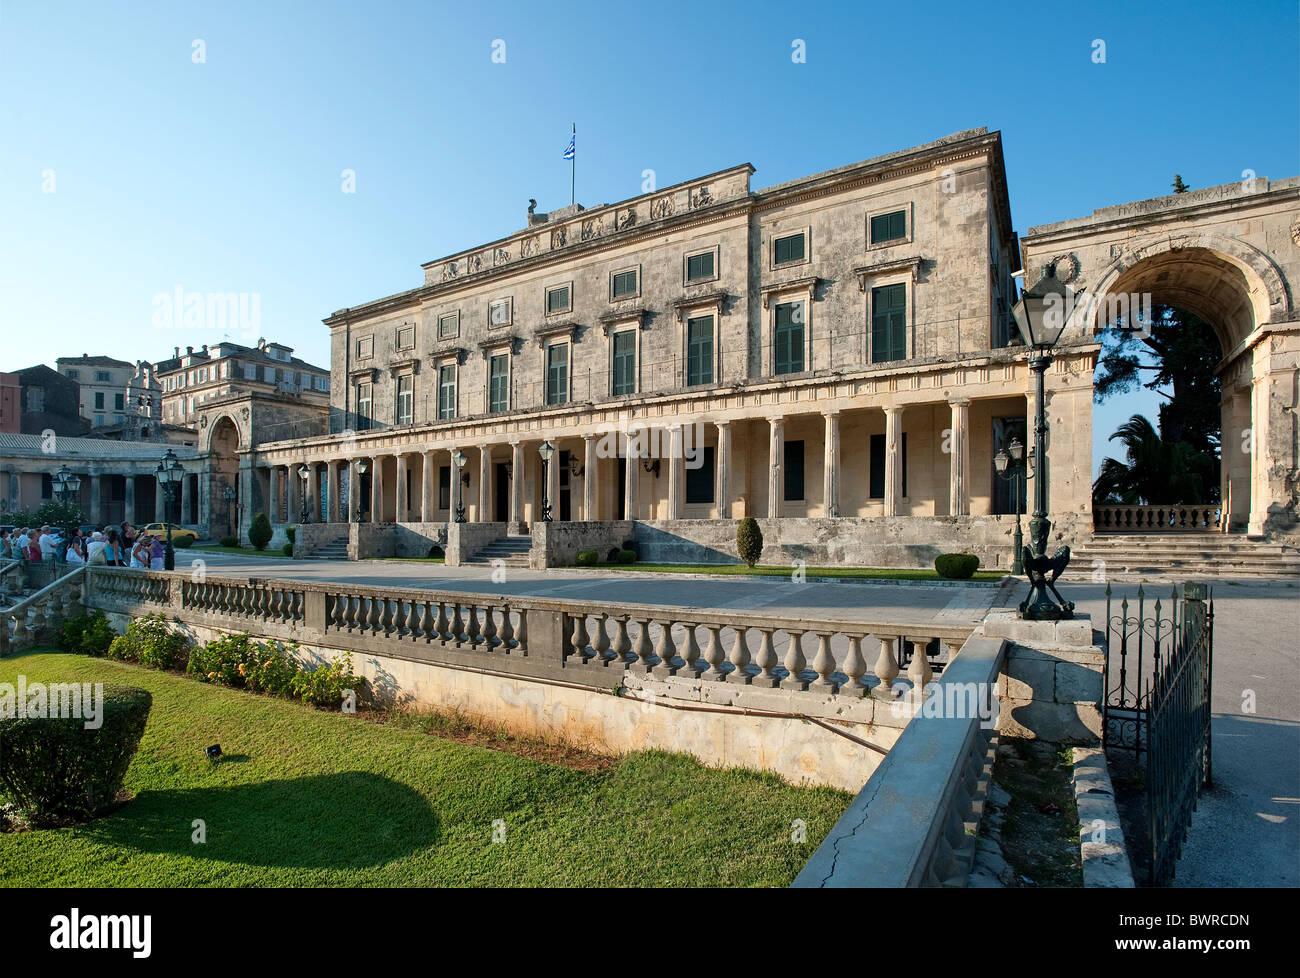 Museum of Asian Art, Corfu Town, Corfu, Greece - Stock Image